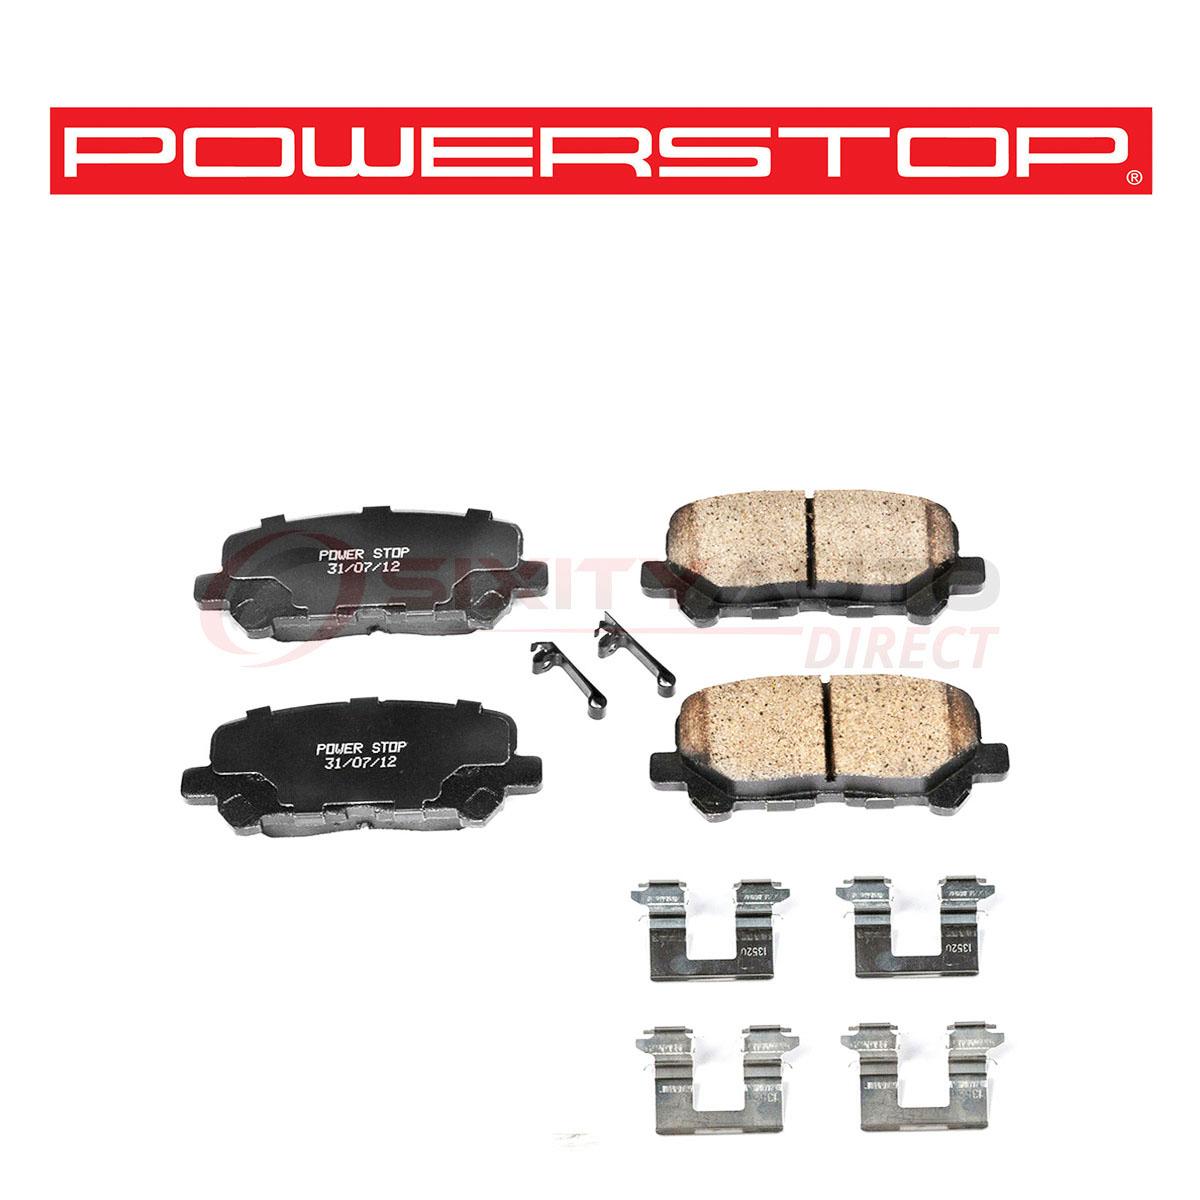 Power Stop Z17 Evolution Plus Disc Brake Pad For 2012-2013